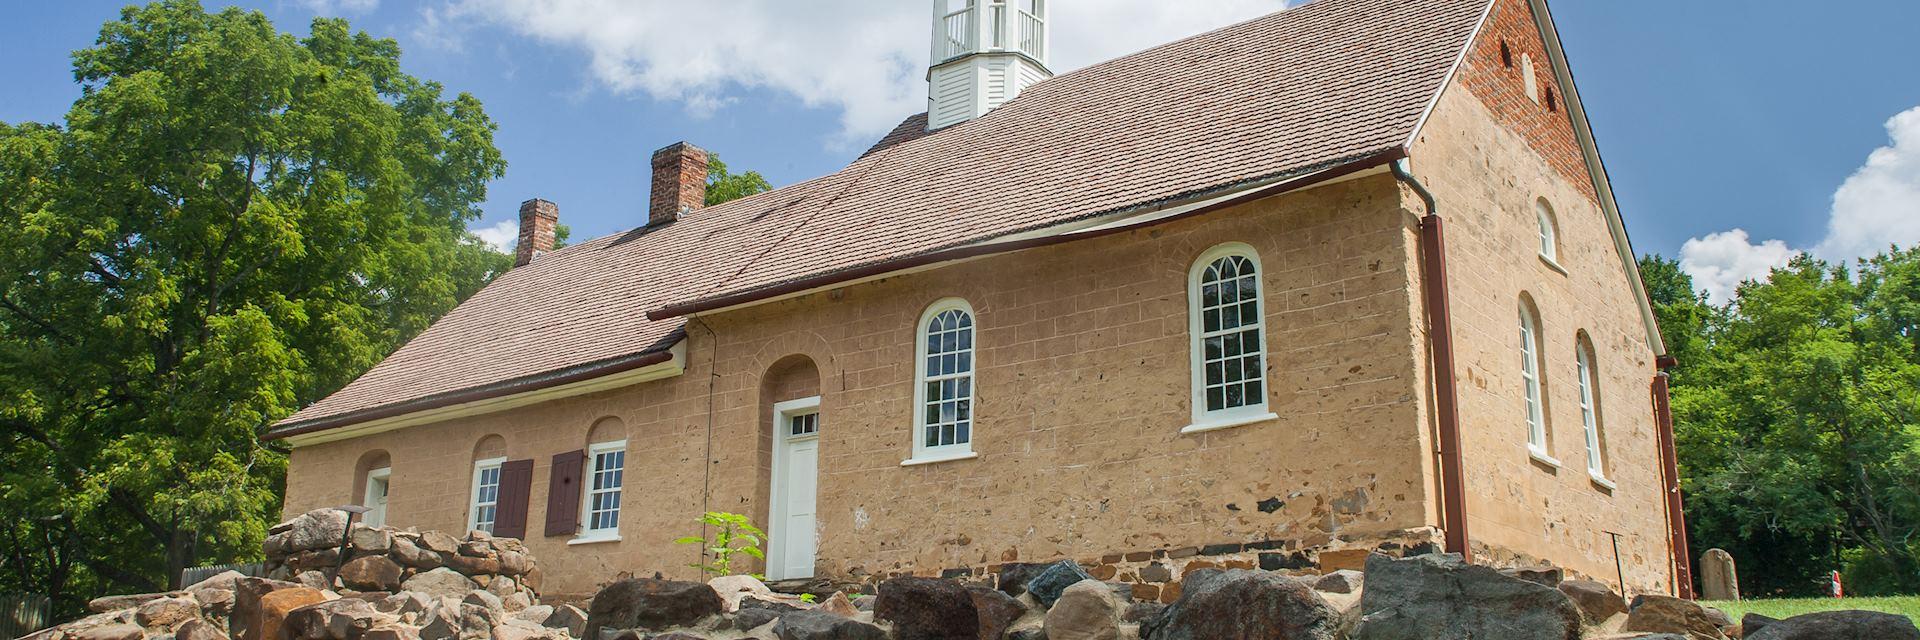 Church in Winston-Salem